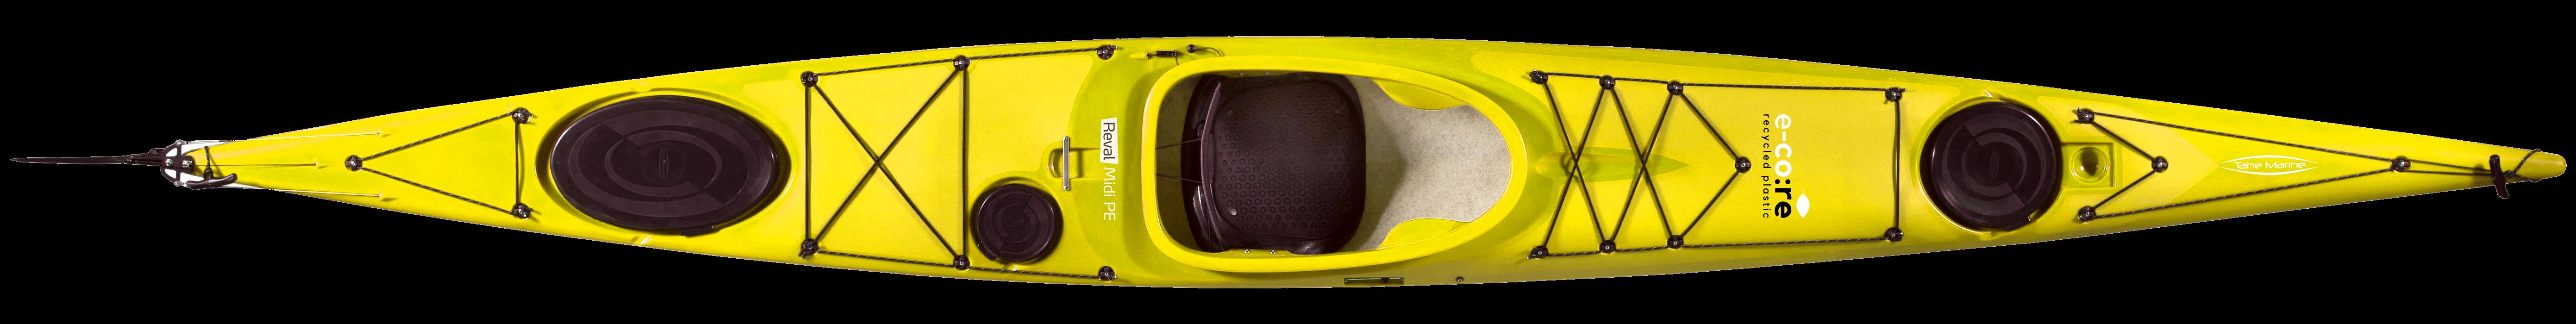 Reval Midi PE